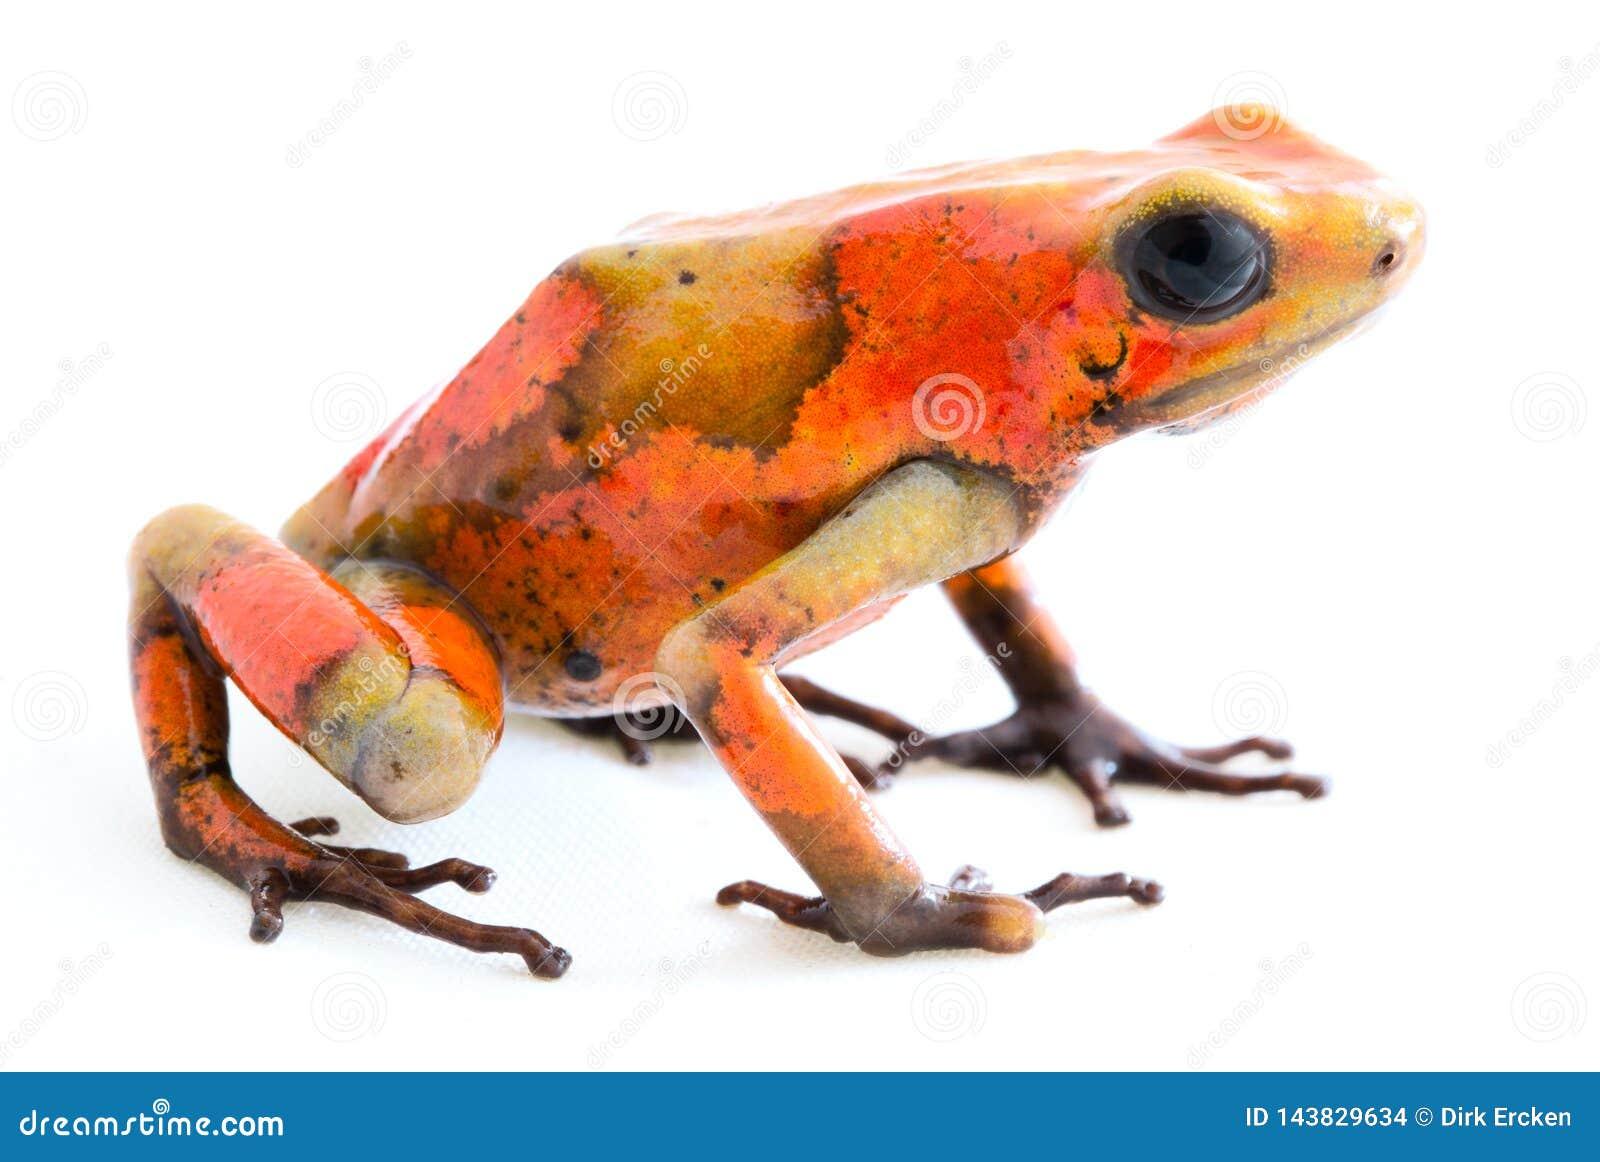 Poison dart frog, Oophaga histrionica